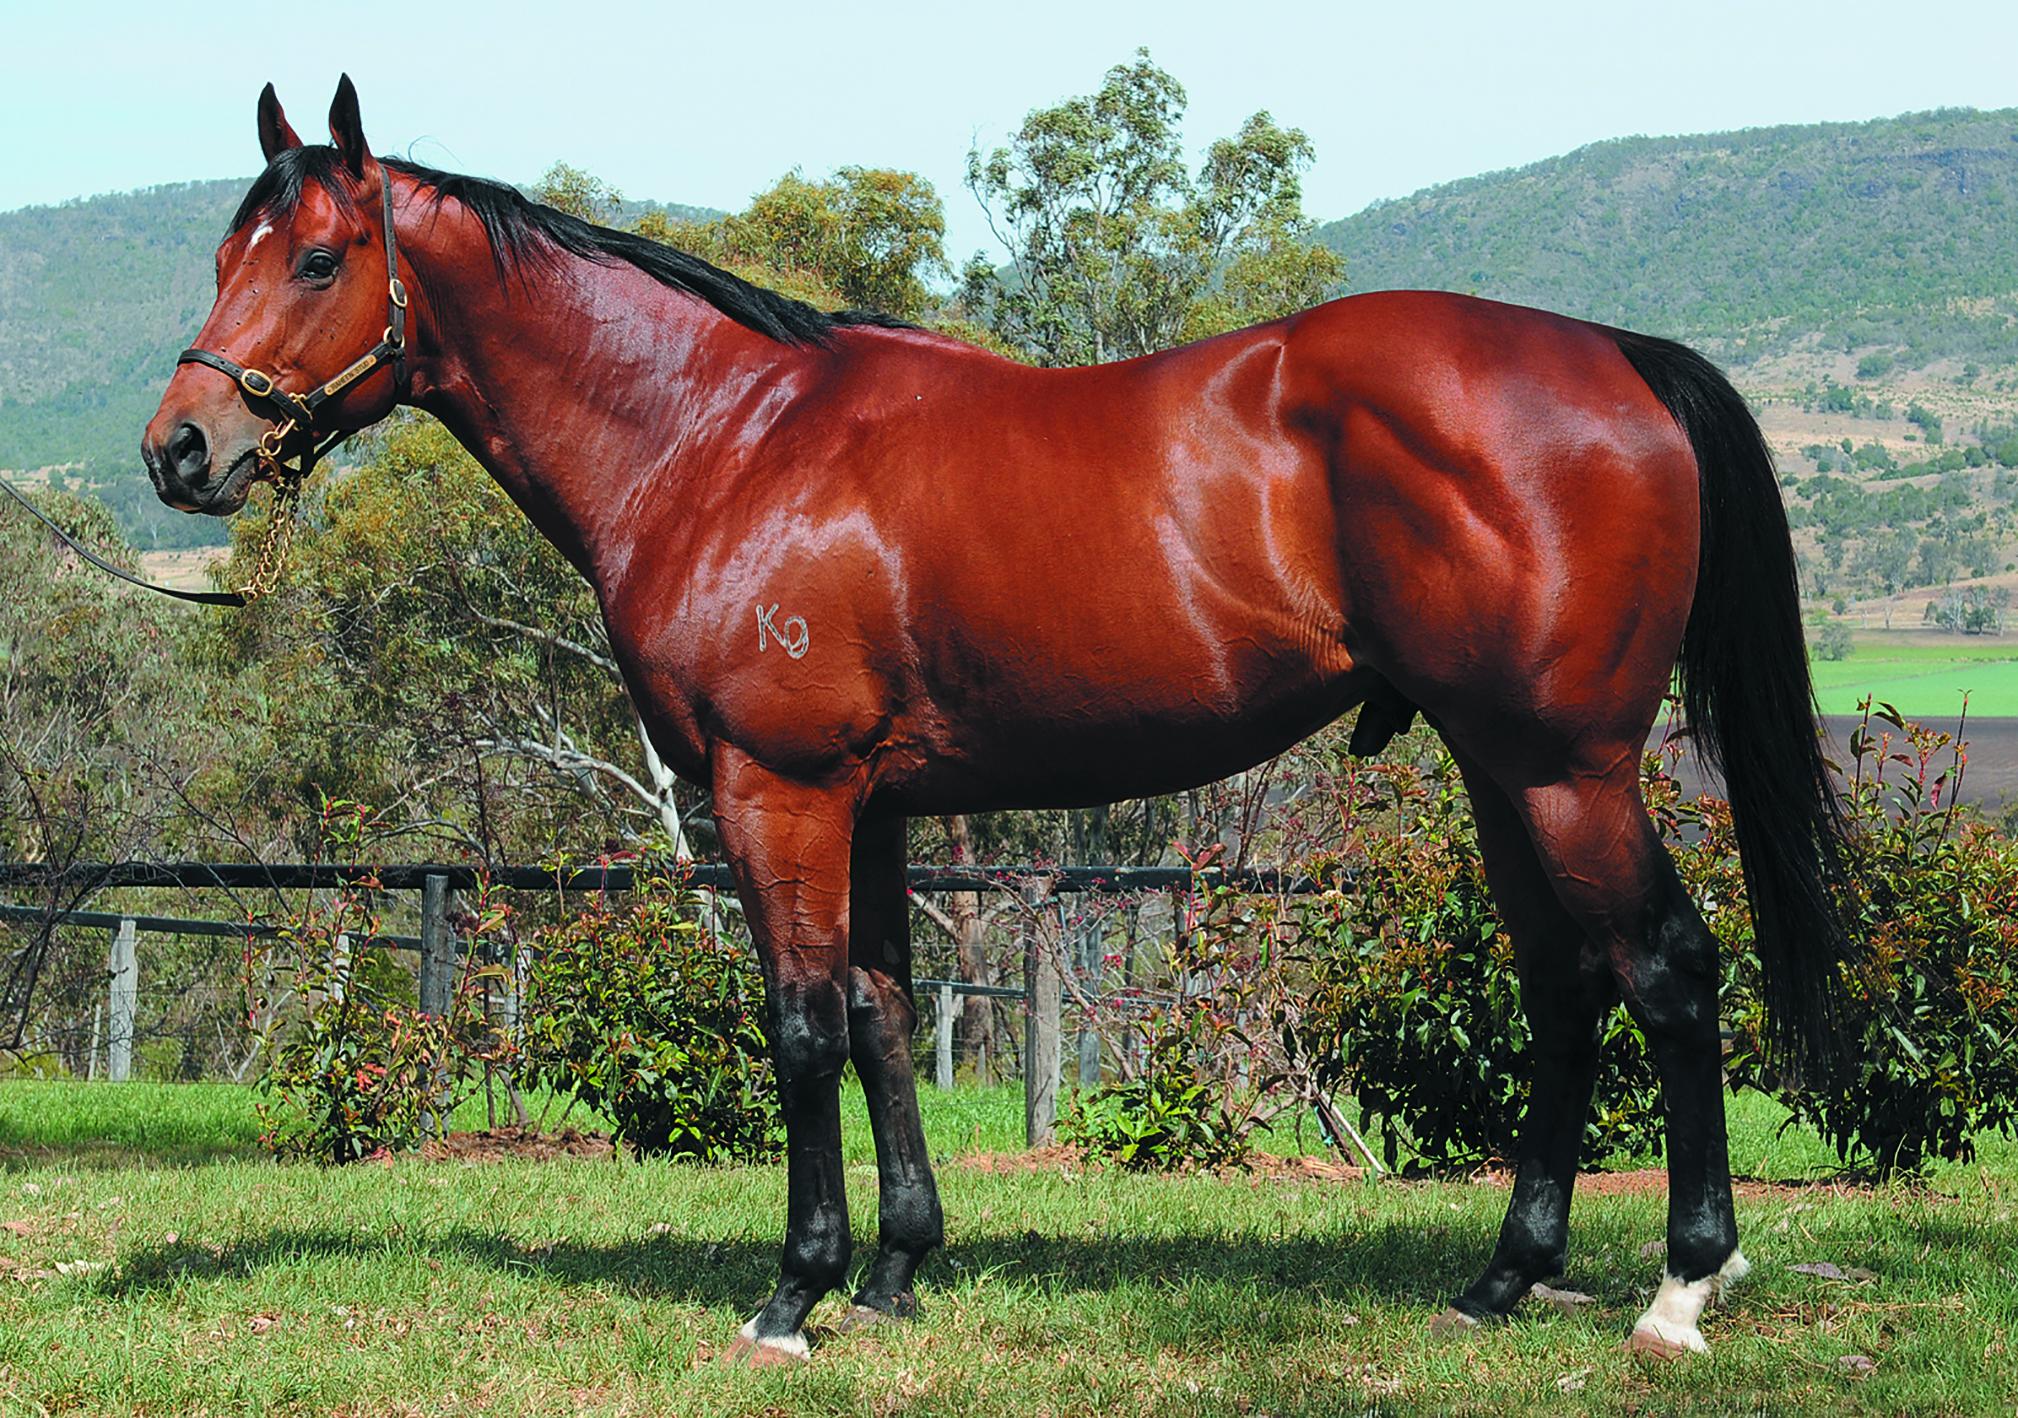 https://www.stallions.com.au/wp-content/uploads/2020/01/Golden-Archer_AAedit_2015.jpg